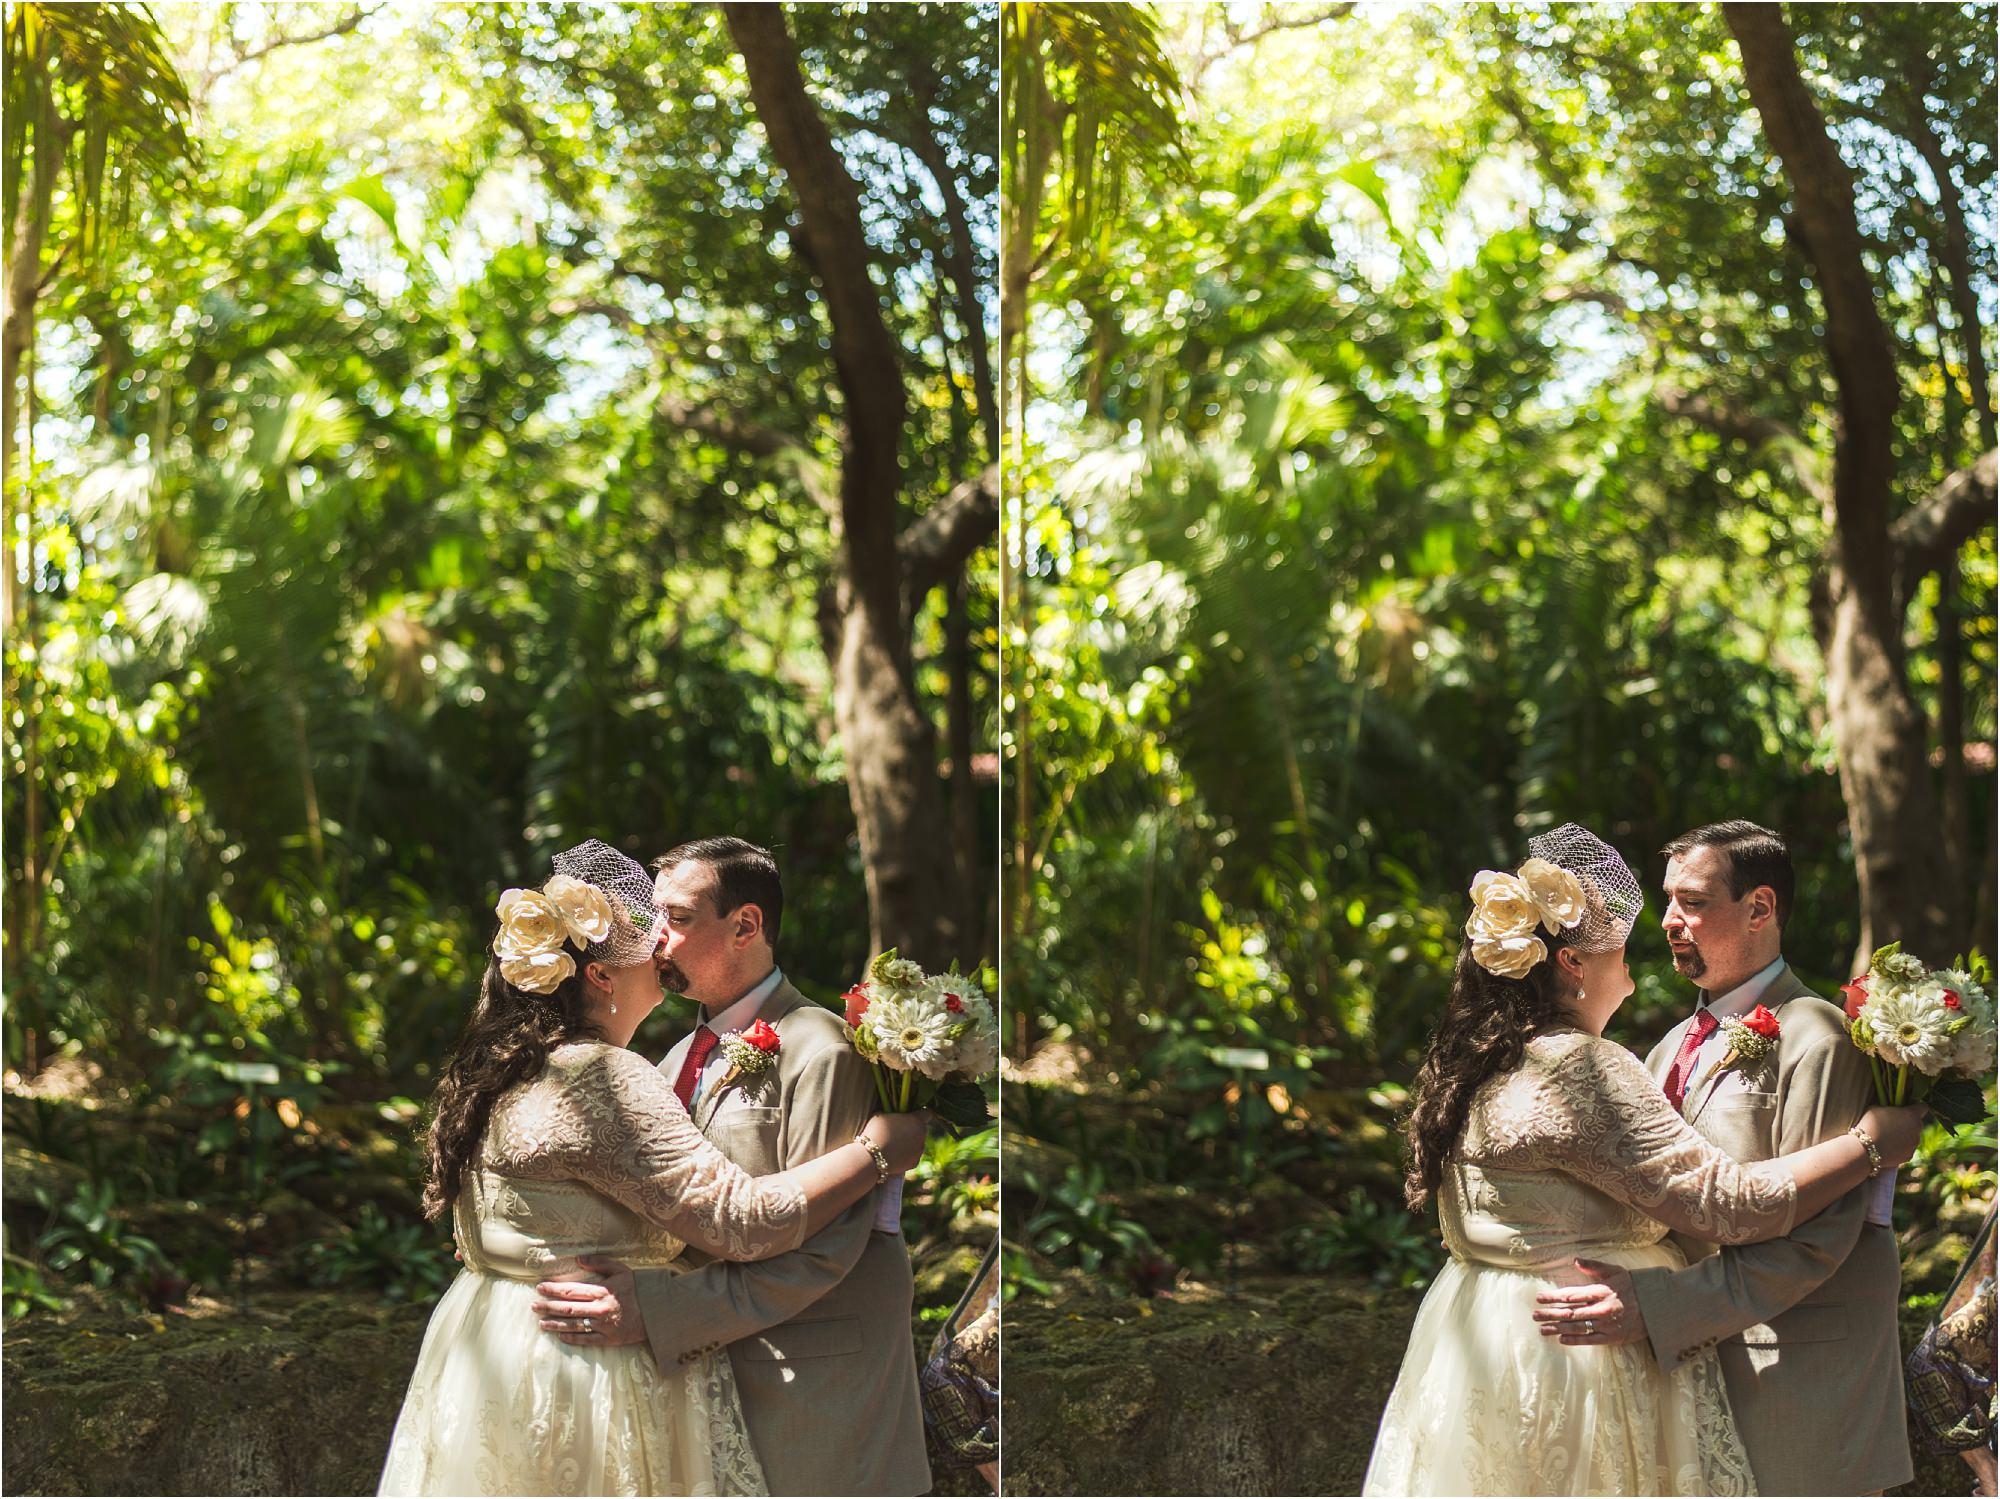 outdoor-rustic-pincrest-gardens-wedding-miami-photographer-jessenia-gonzalez_1048.jpg